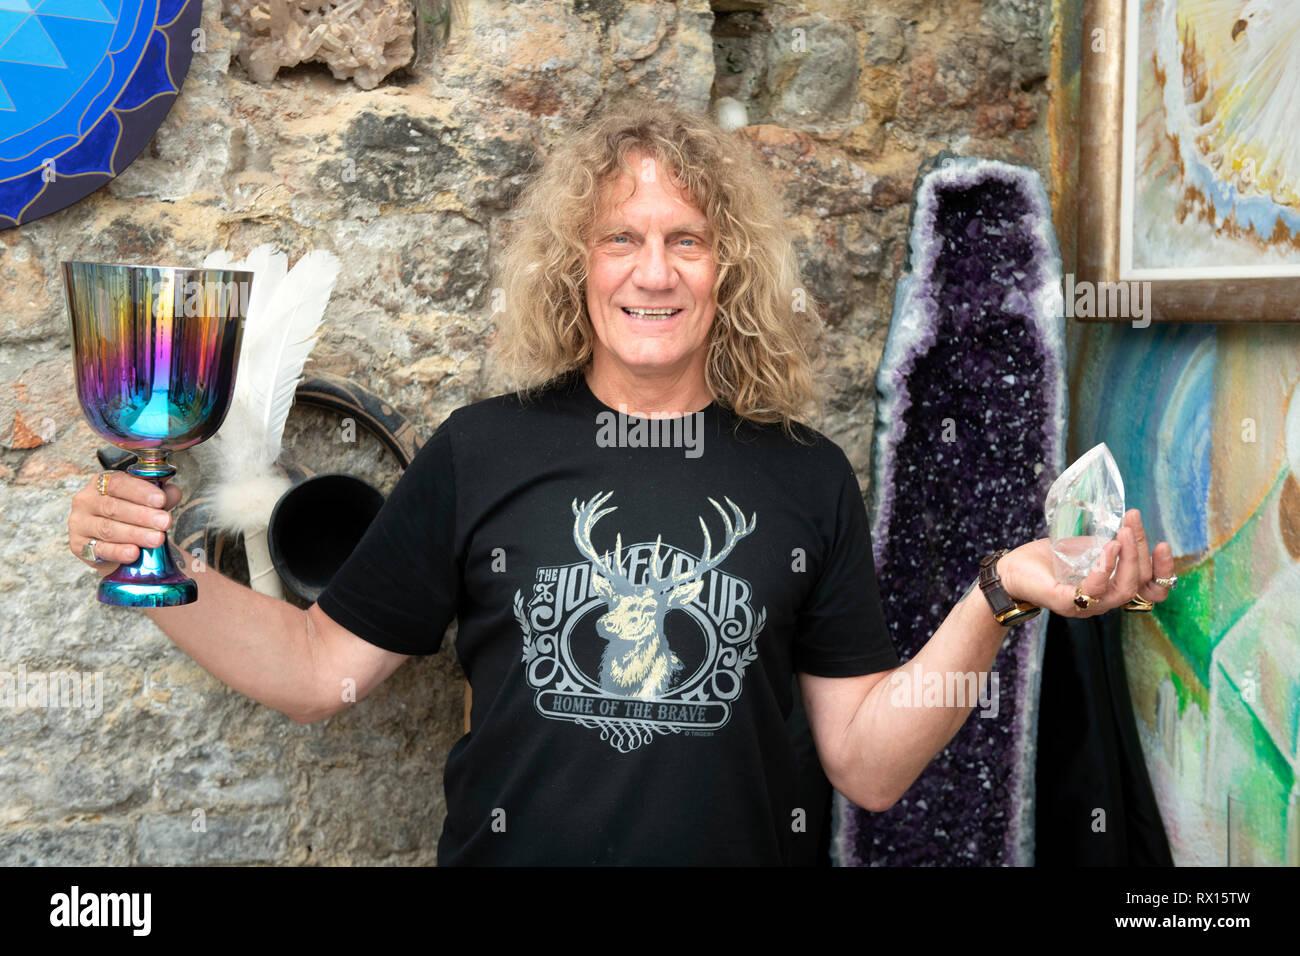 The crystal therapist Lui Krieg in Glastonbury, Somerset UK - Stock Image